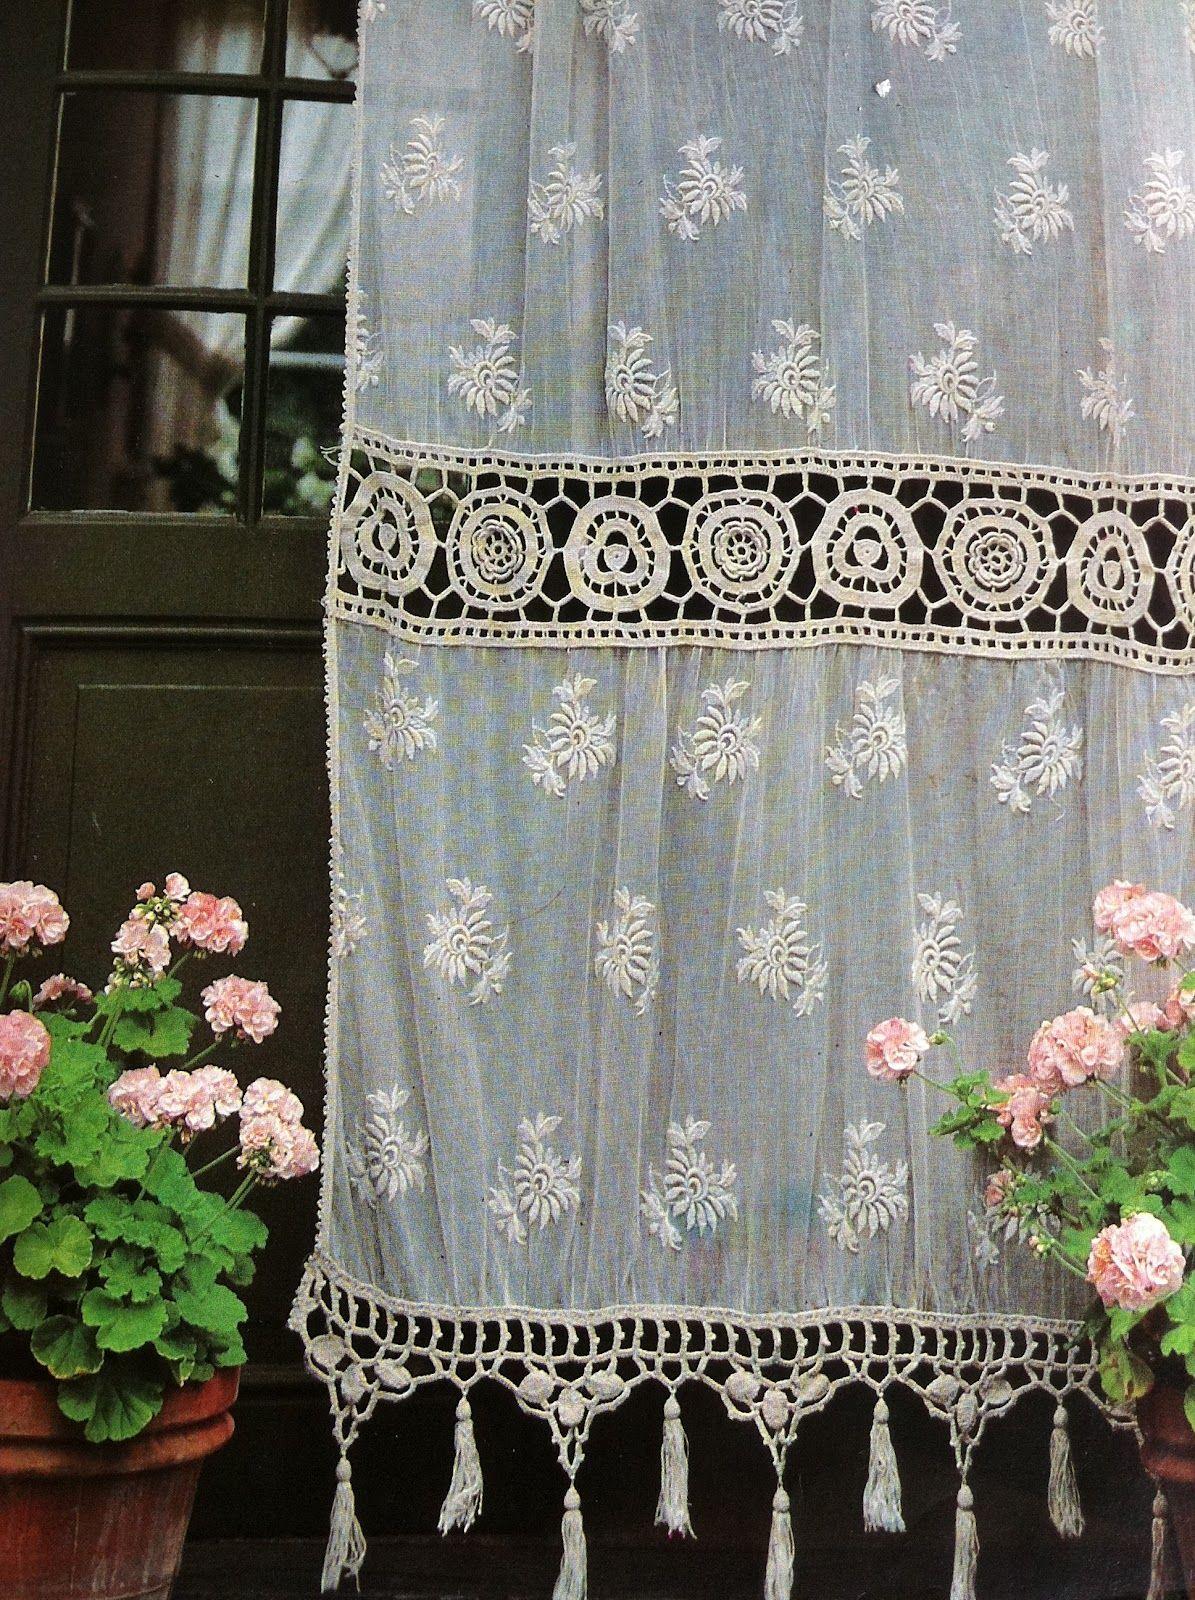 Window well decoration ideas  stunning cool tips curtains bohemian bohemia ikea curtains decor